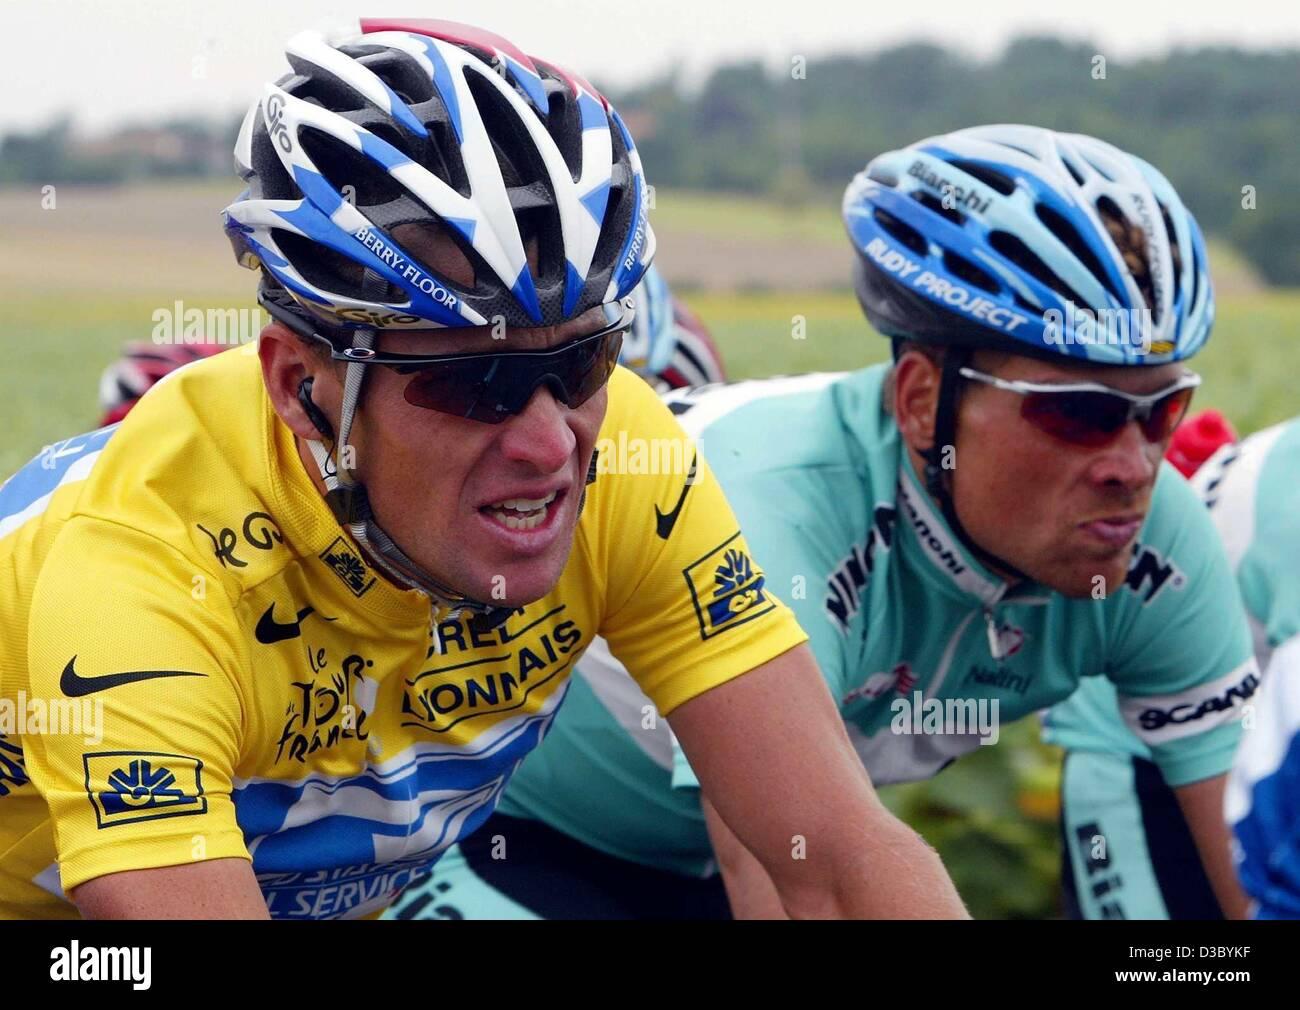 Sports Spo Cycling Tour de france Riding Us postal France Stock ... a36d88da1